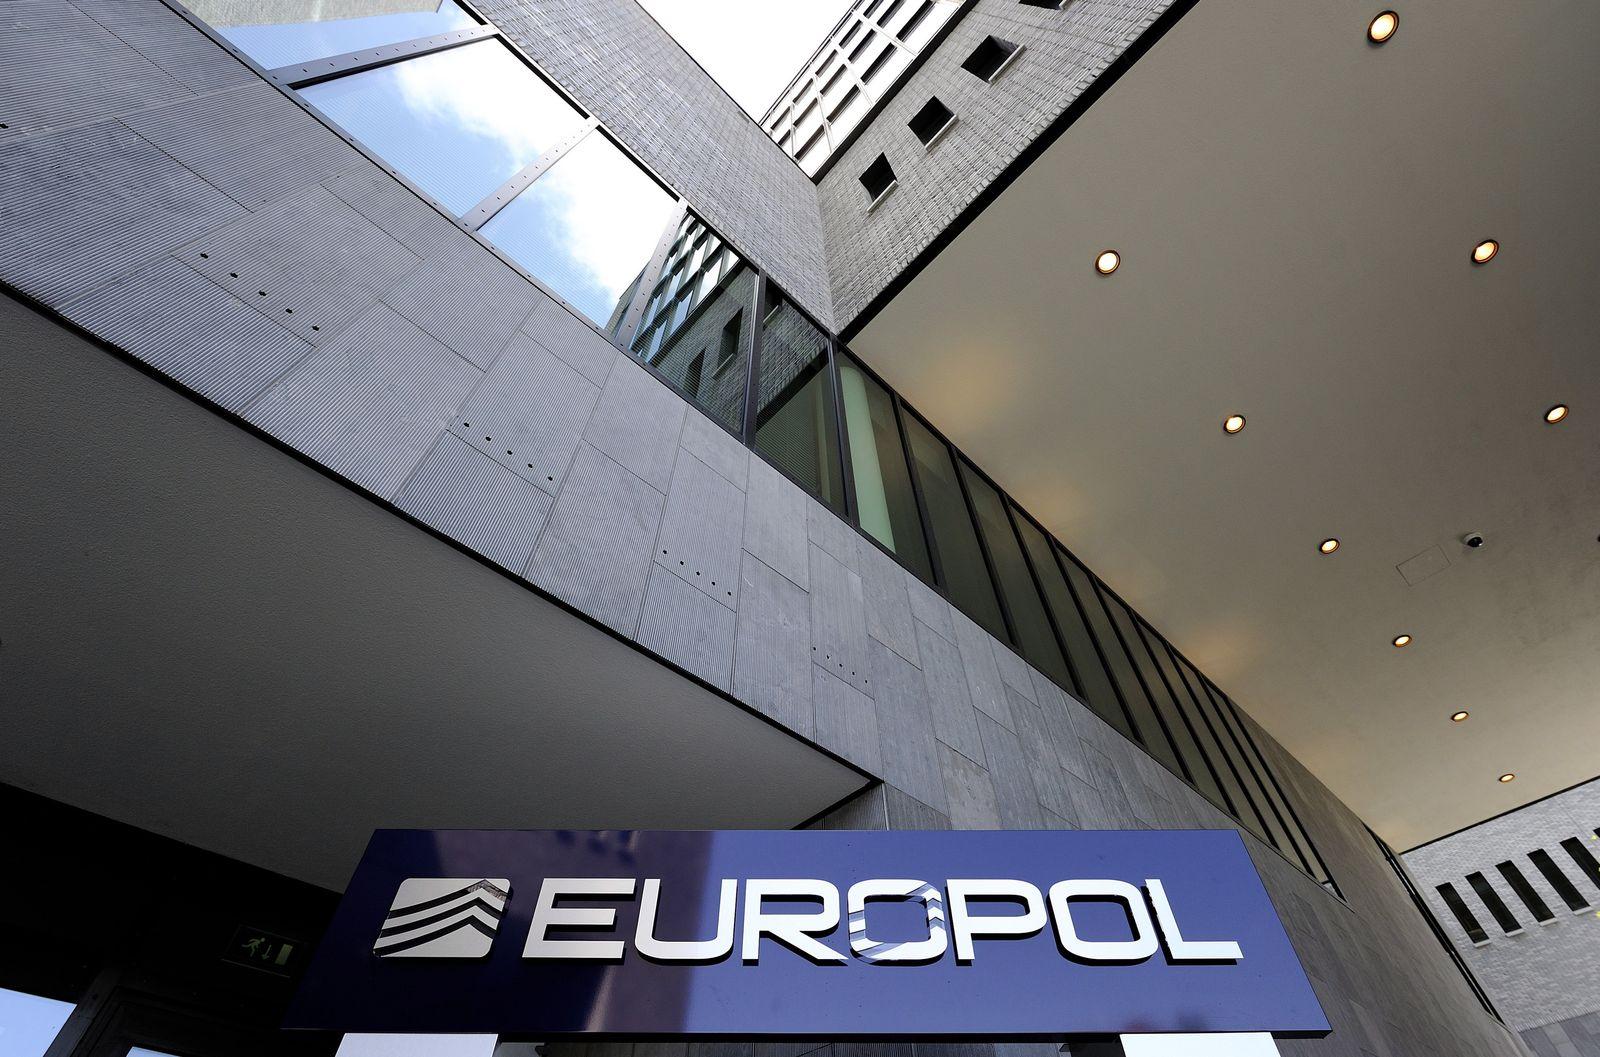 Symbolbild Europol/ Hauptsitz/ Headquarter